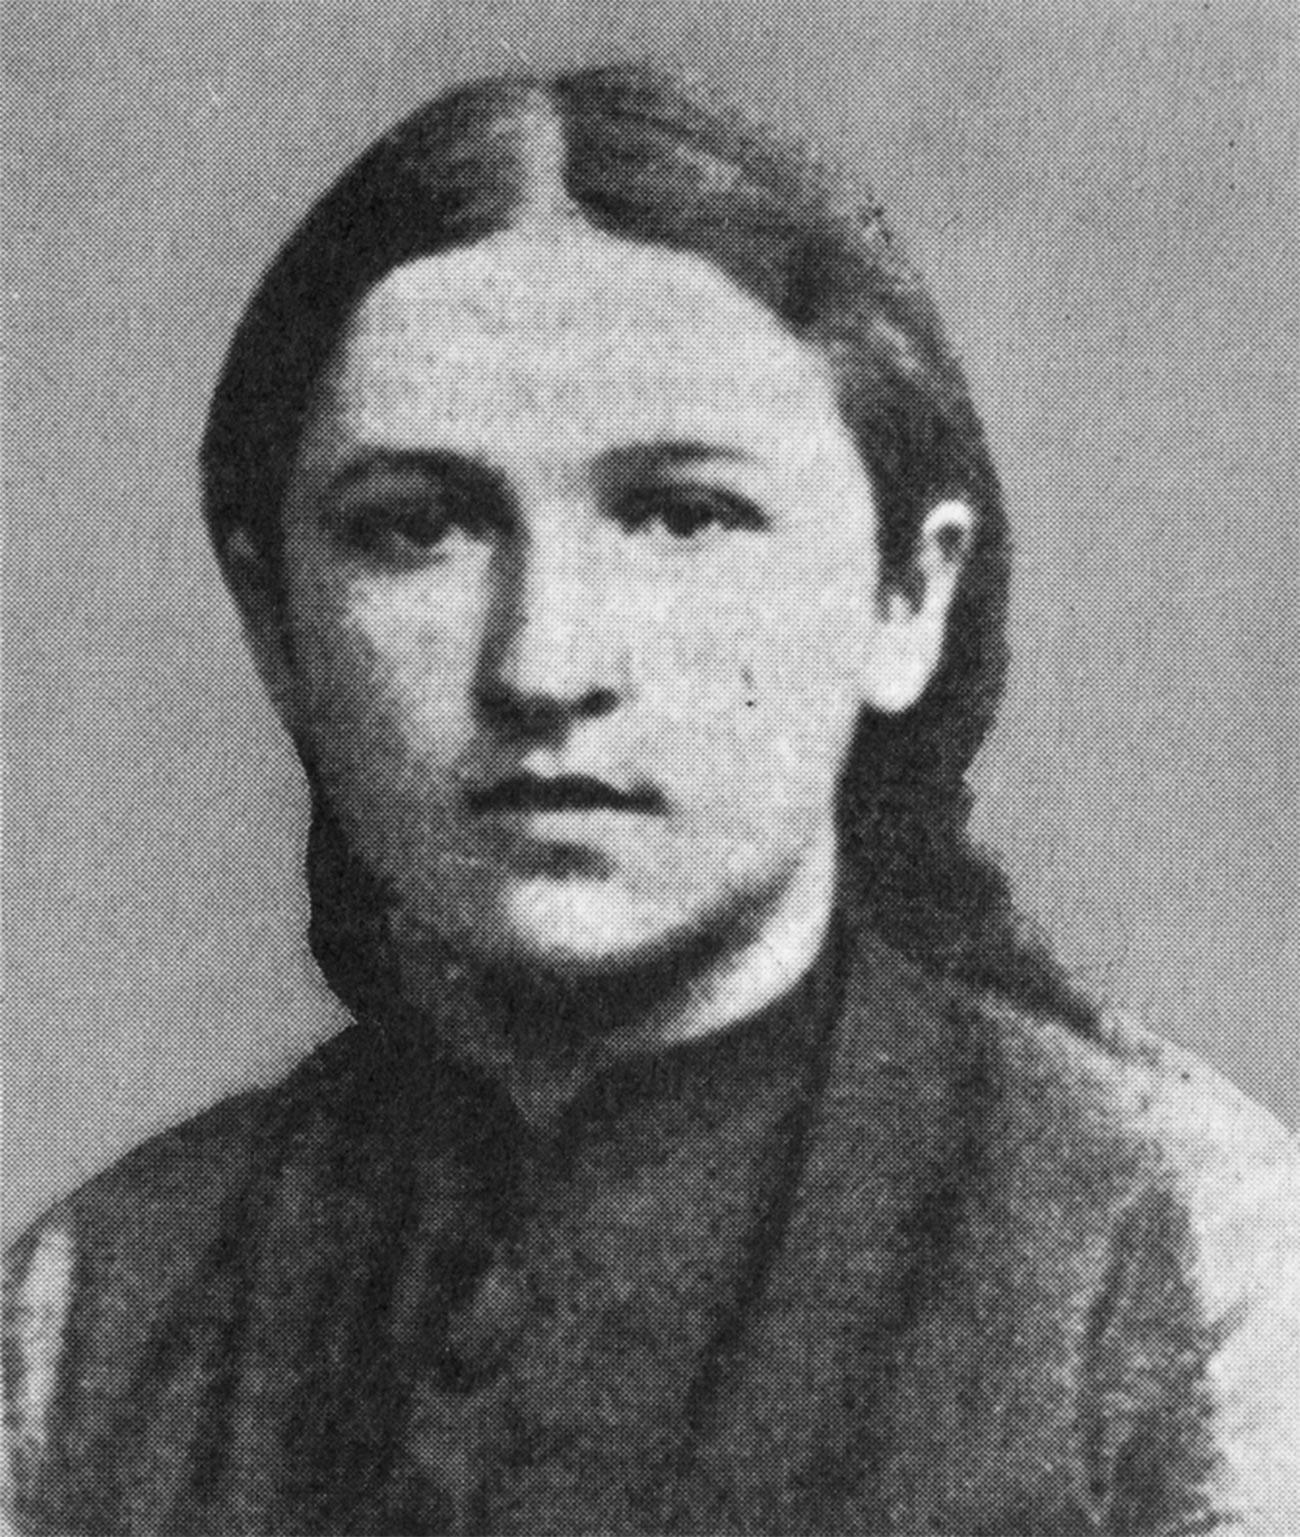 Vera Zassoulitch